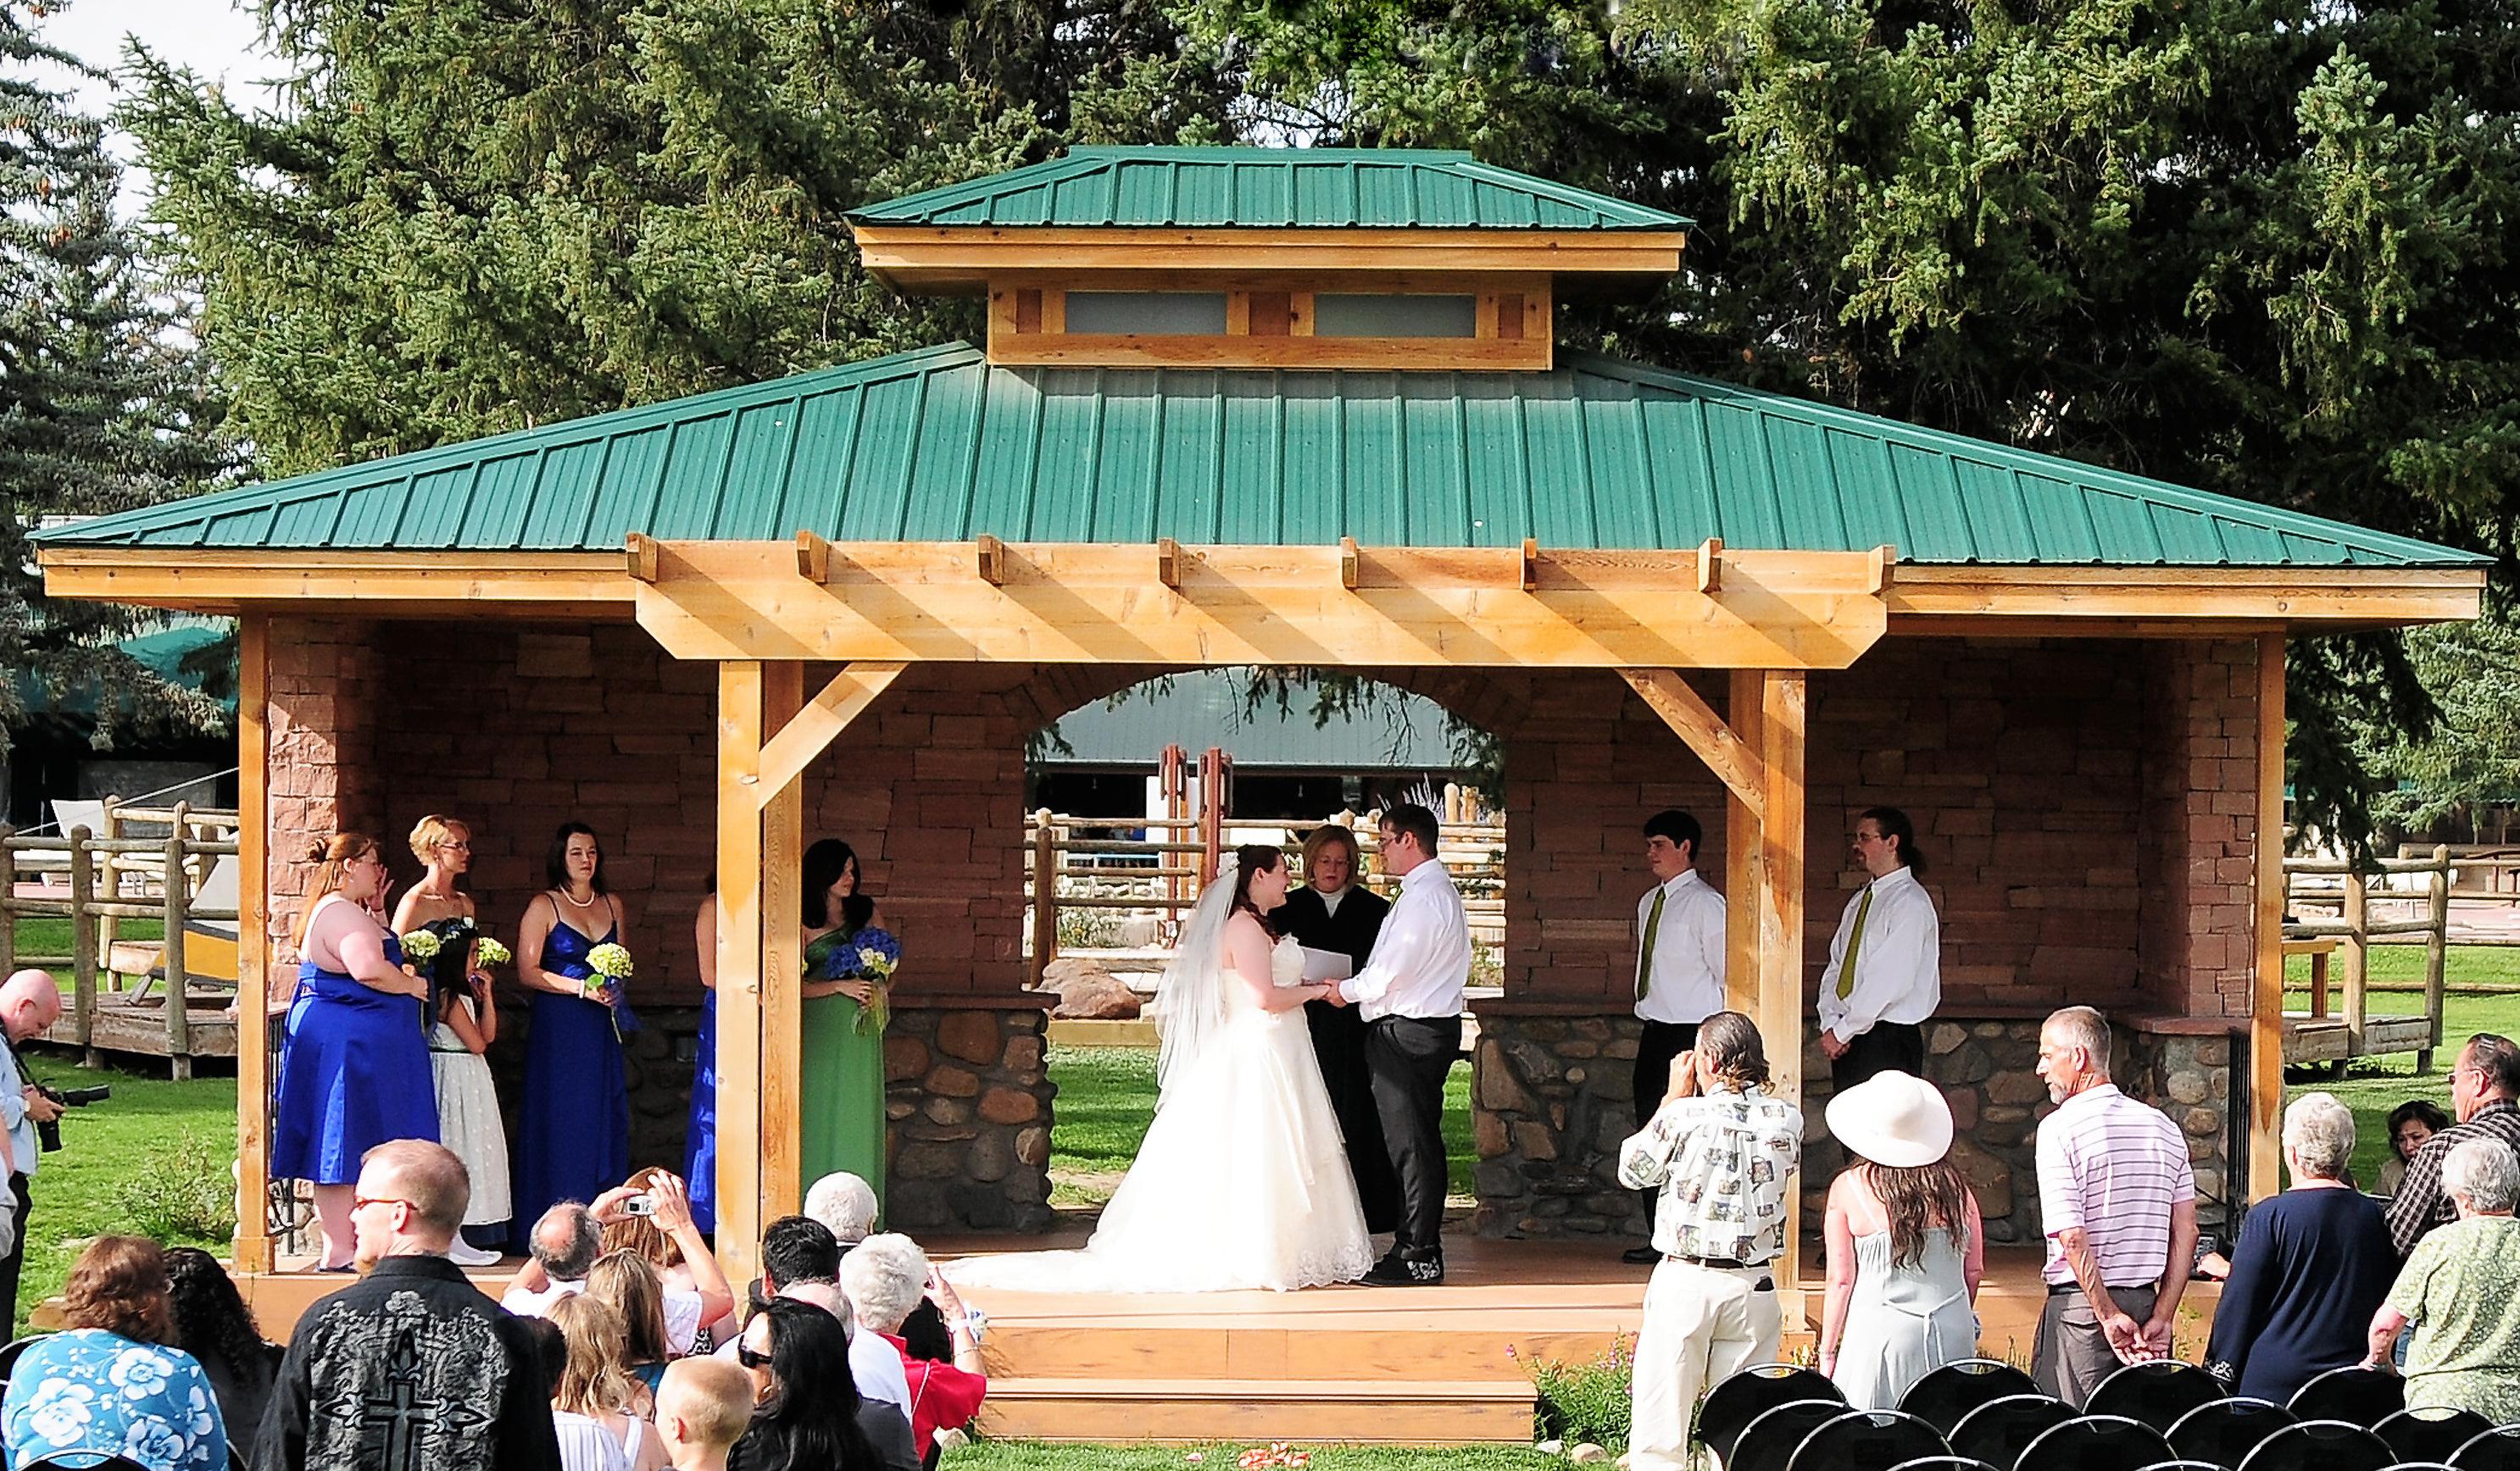 weddings at saratoga resort and spa